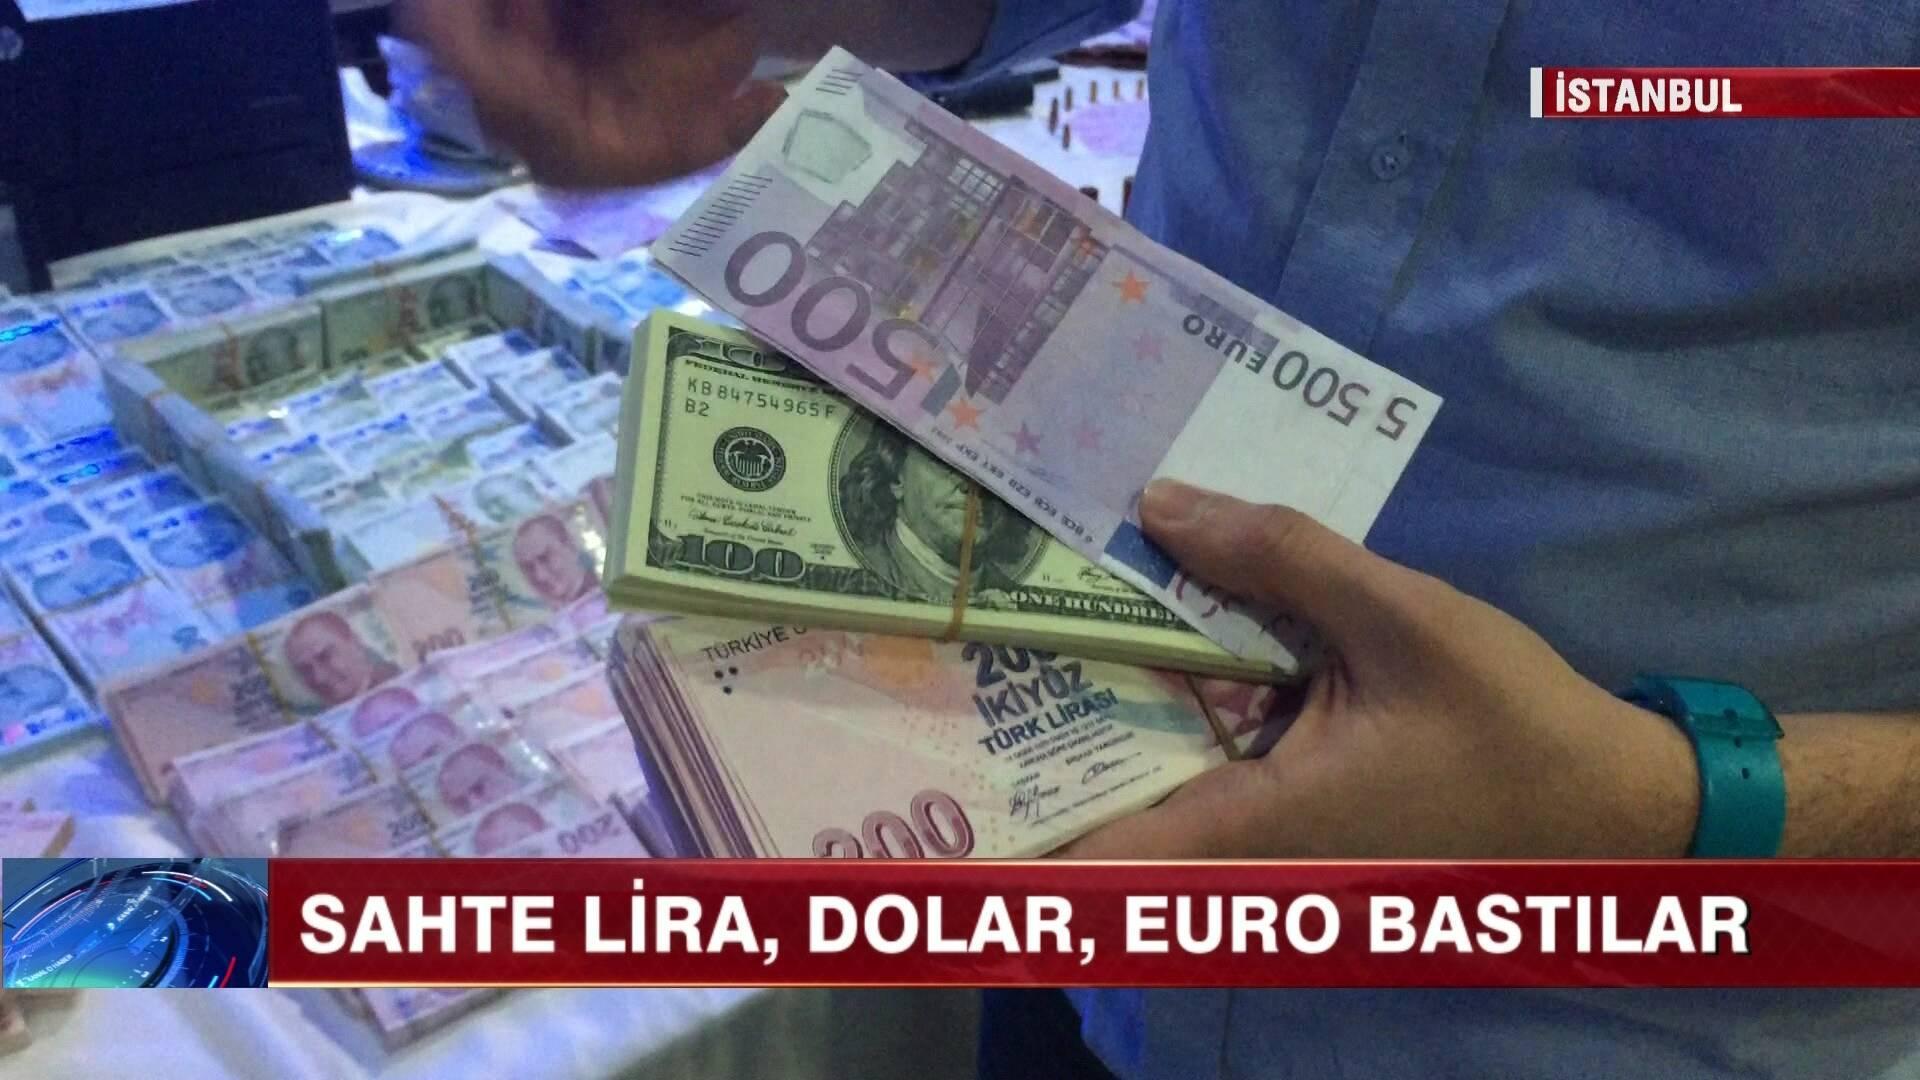 Sahte lira, dolar, euro bastılar!